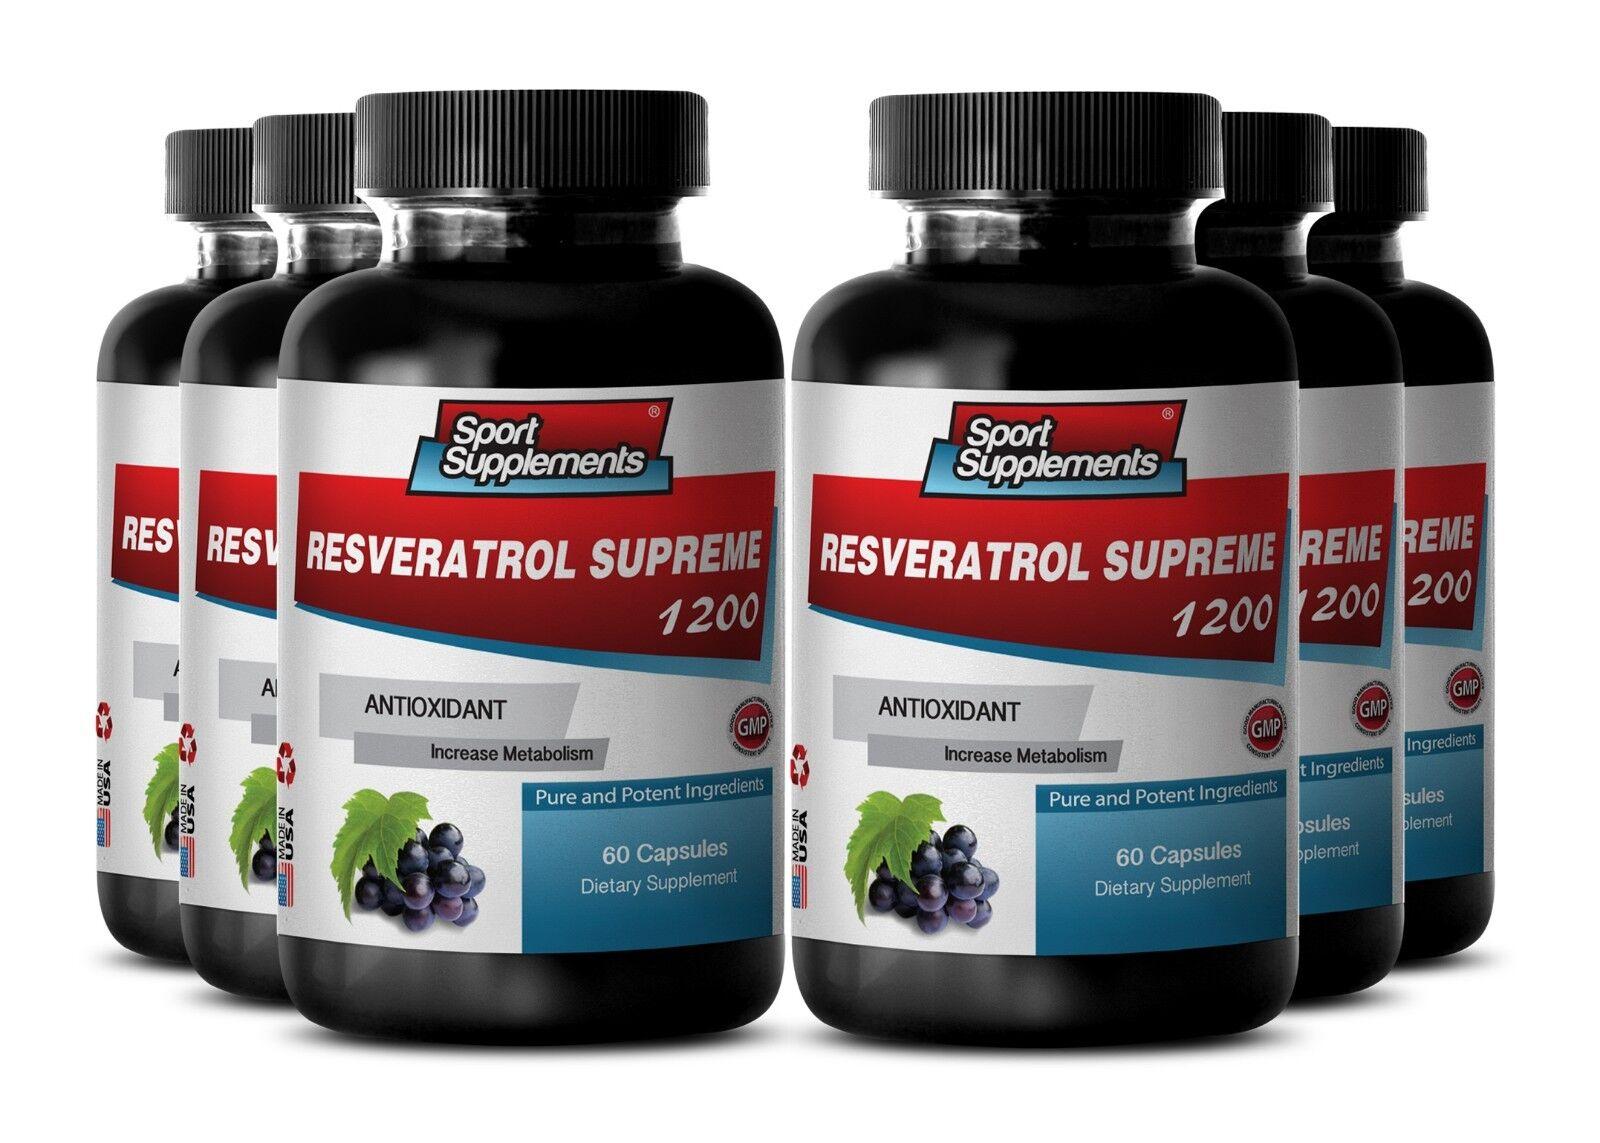 Grün Tea Fat Metabolism Burner - New Resveratrol 1200mg - Metabolism Fat Miracle Capsule 6B 4e9974